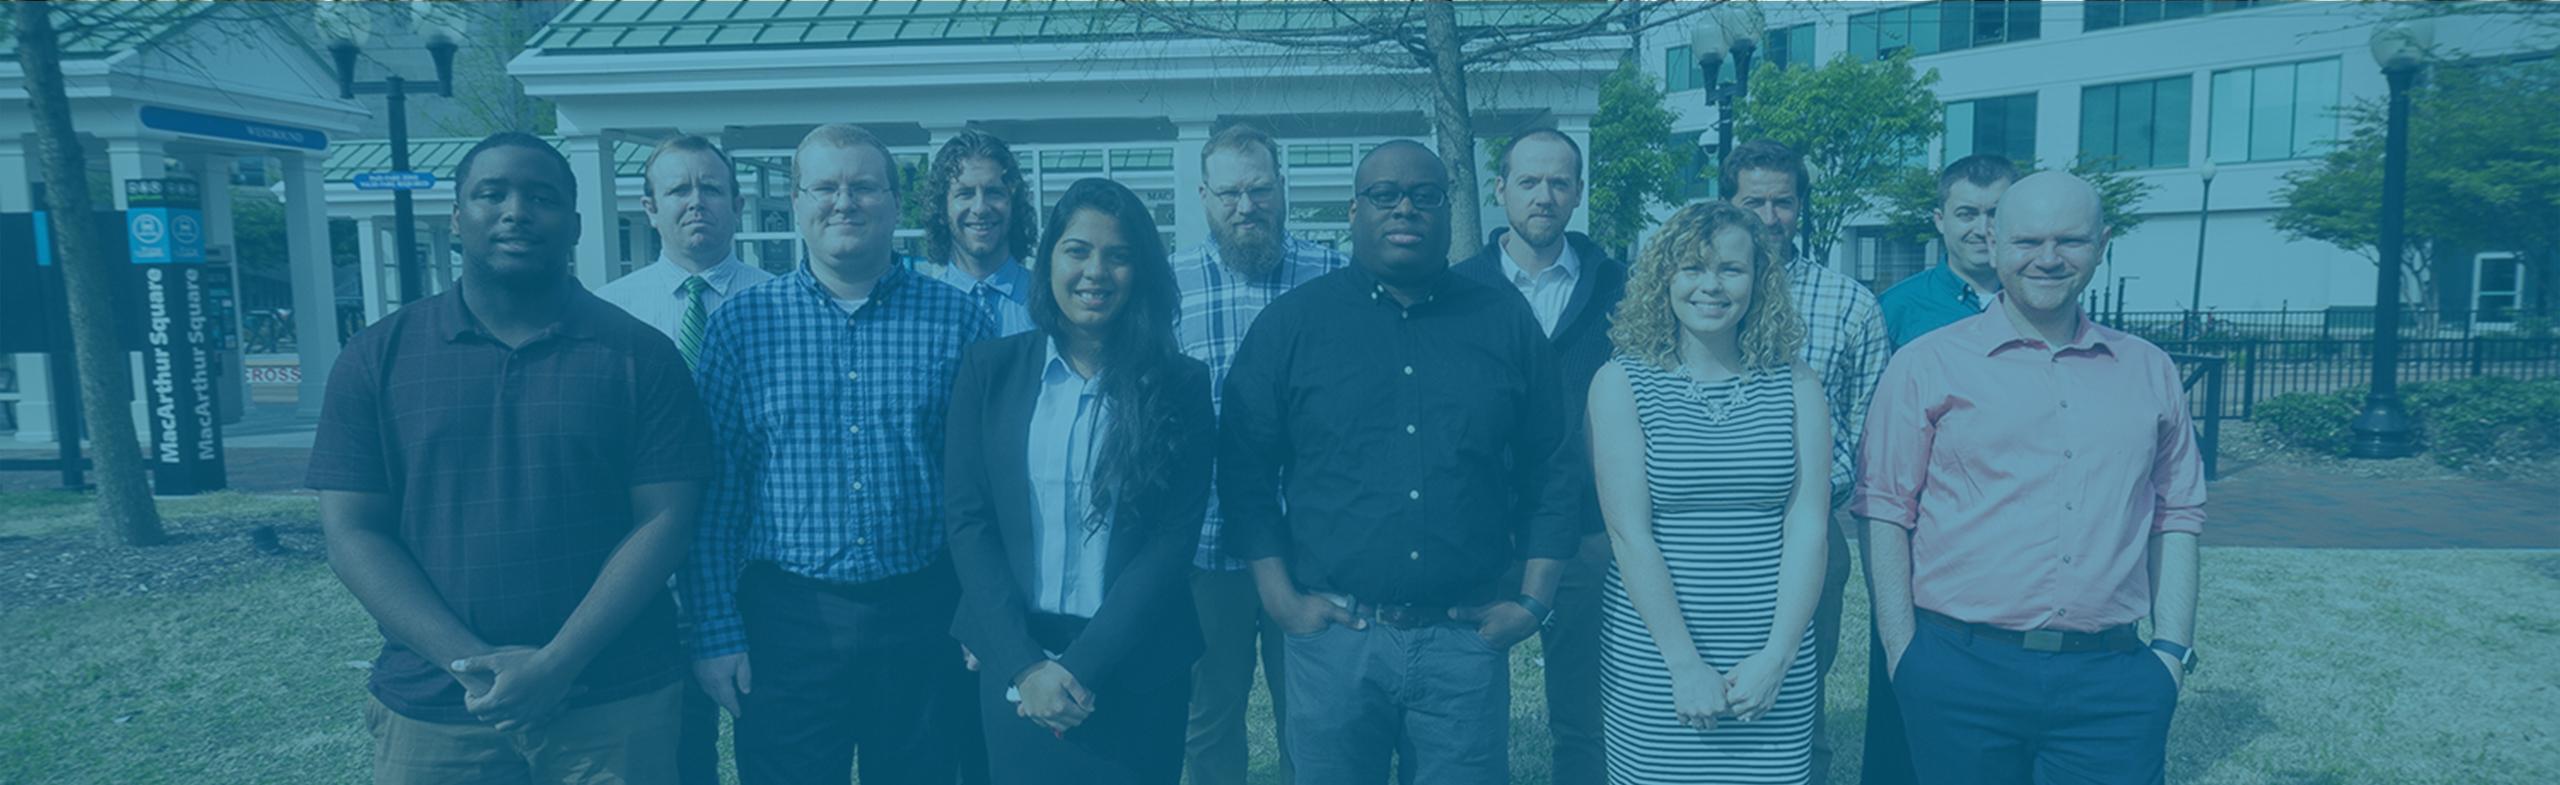 CWS Development Team Members Standing